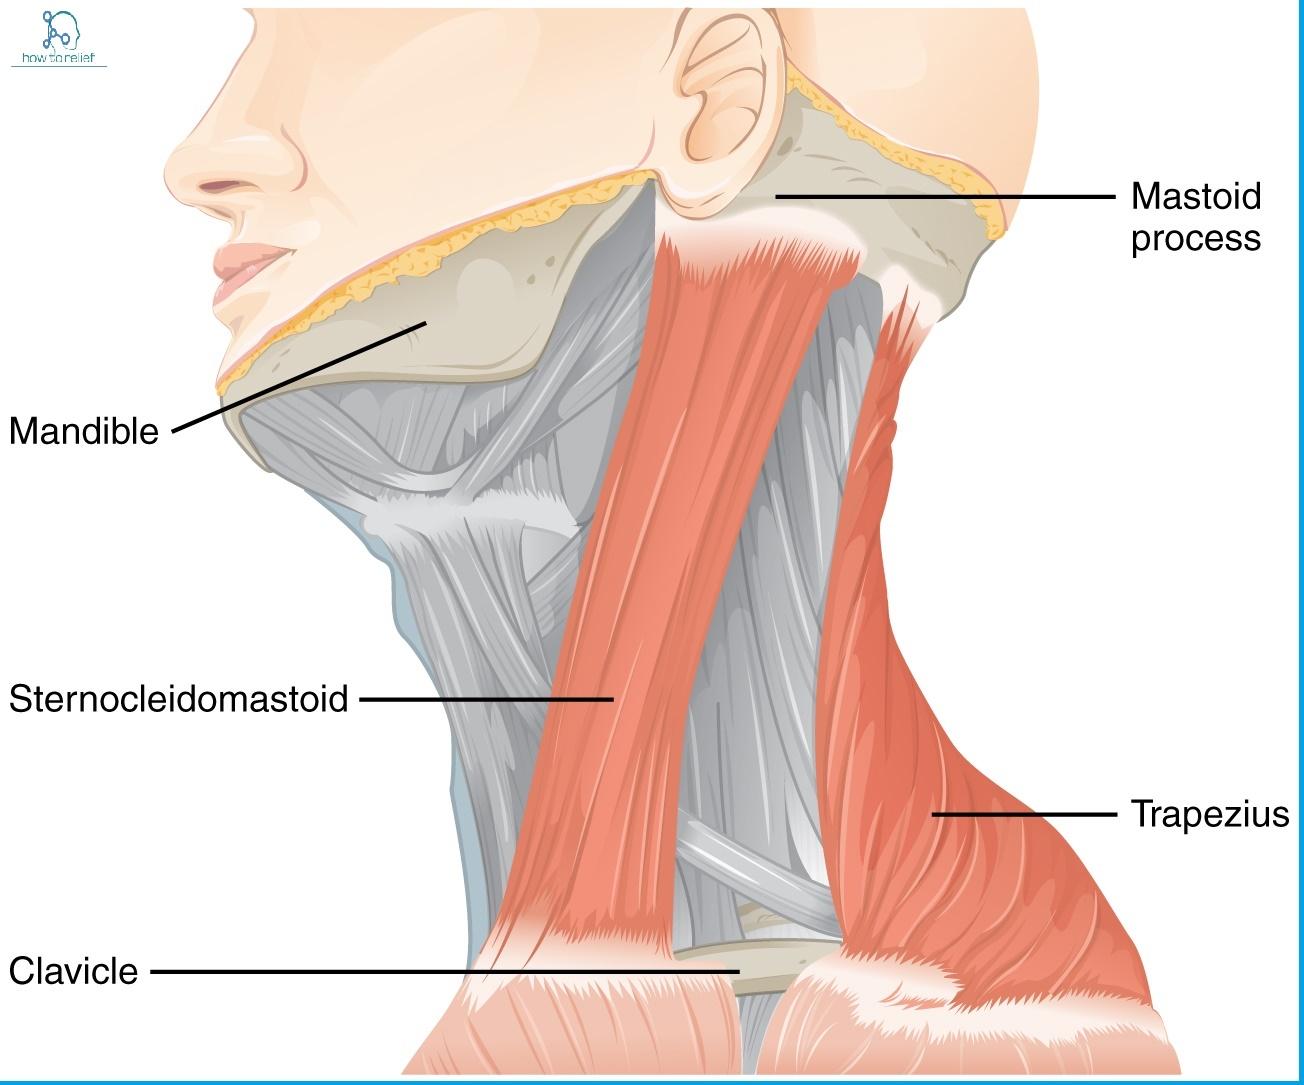 nerves in neck and shoulder diagram three phase star delta wiring typical to wye four wire transformer sternocleidomastoid origin insertion nerve supply